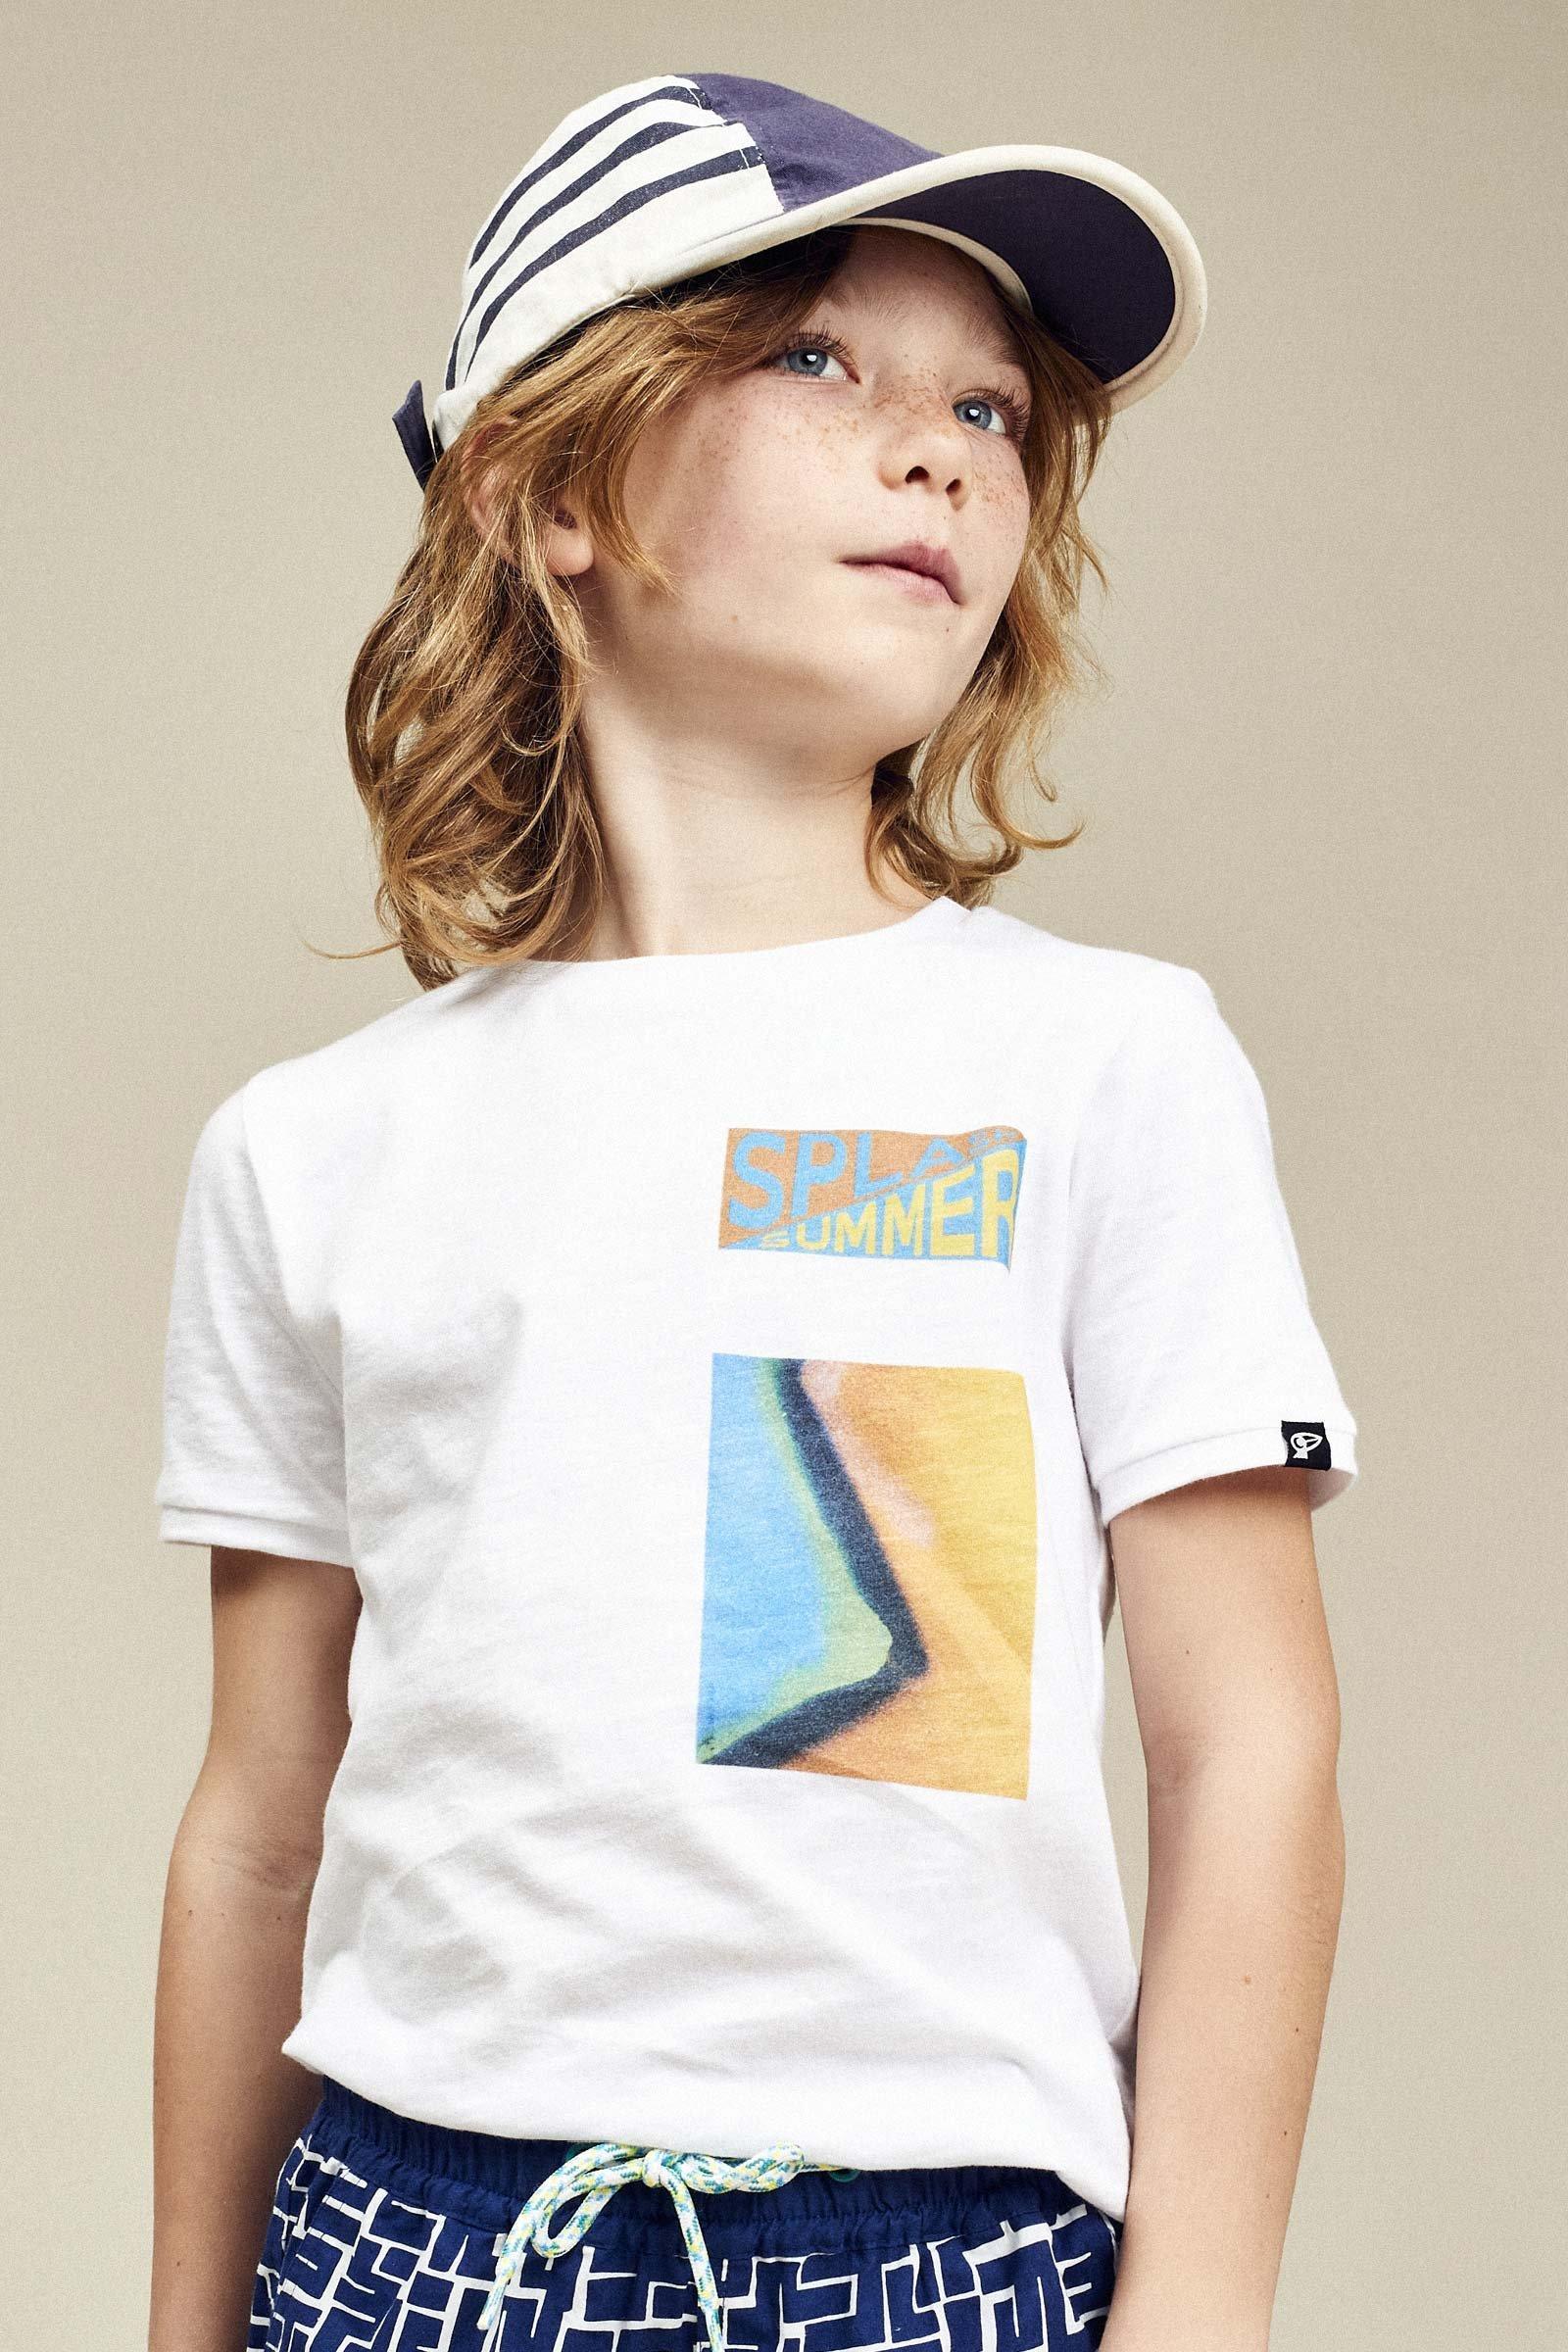 CKS Kids - YORIS - t-shirt korte mouwen - wit